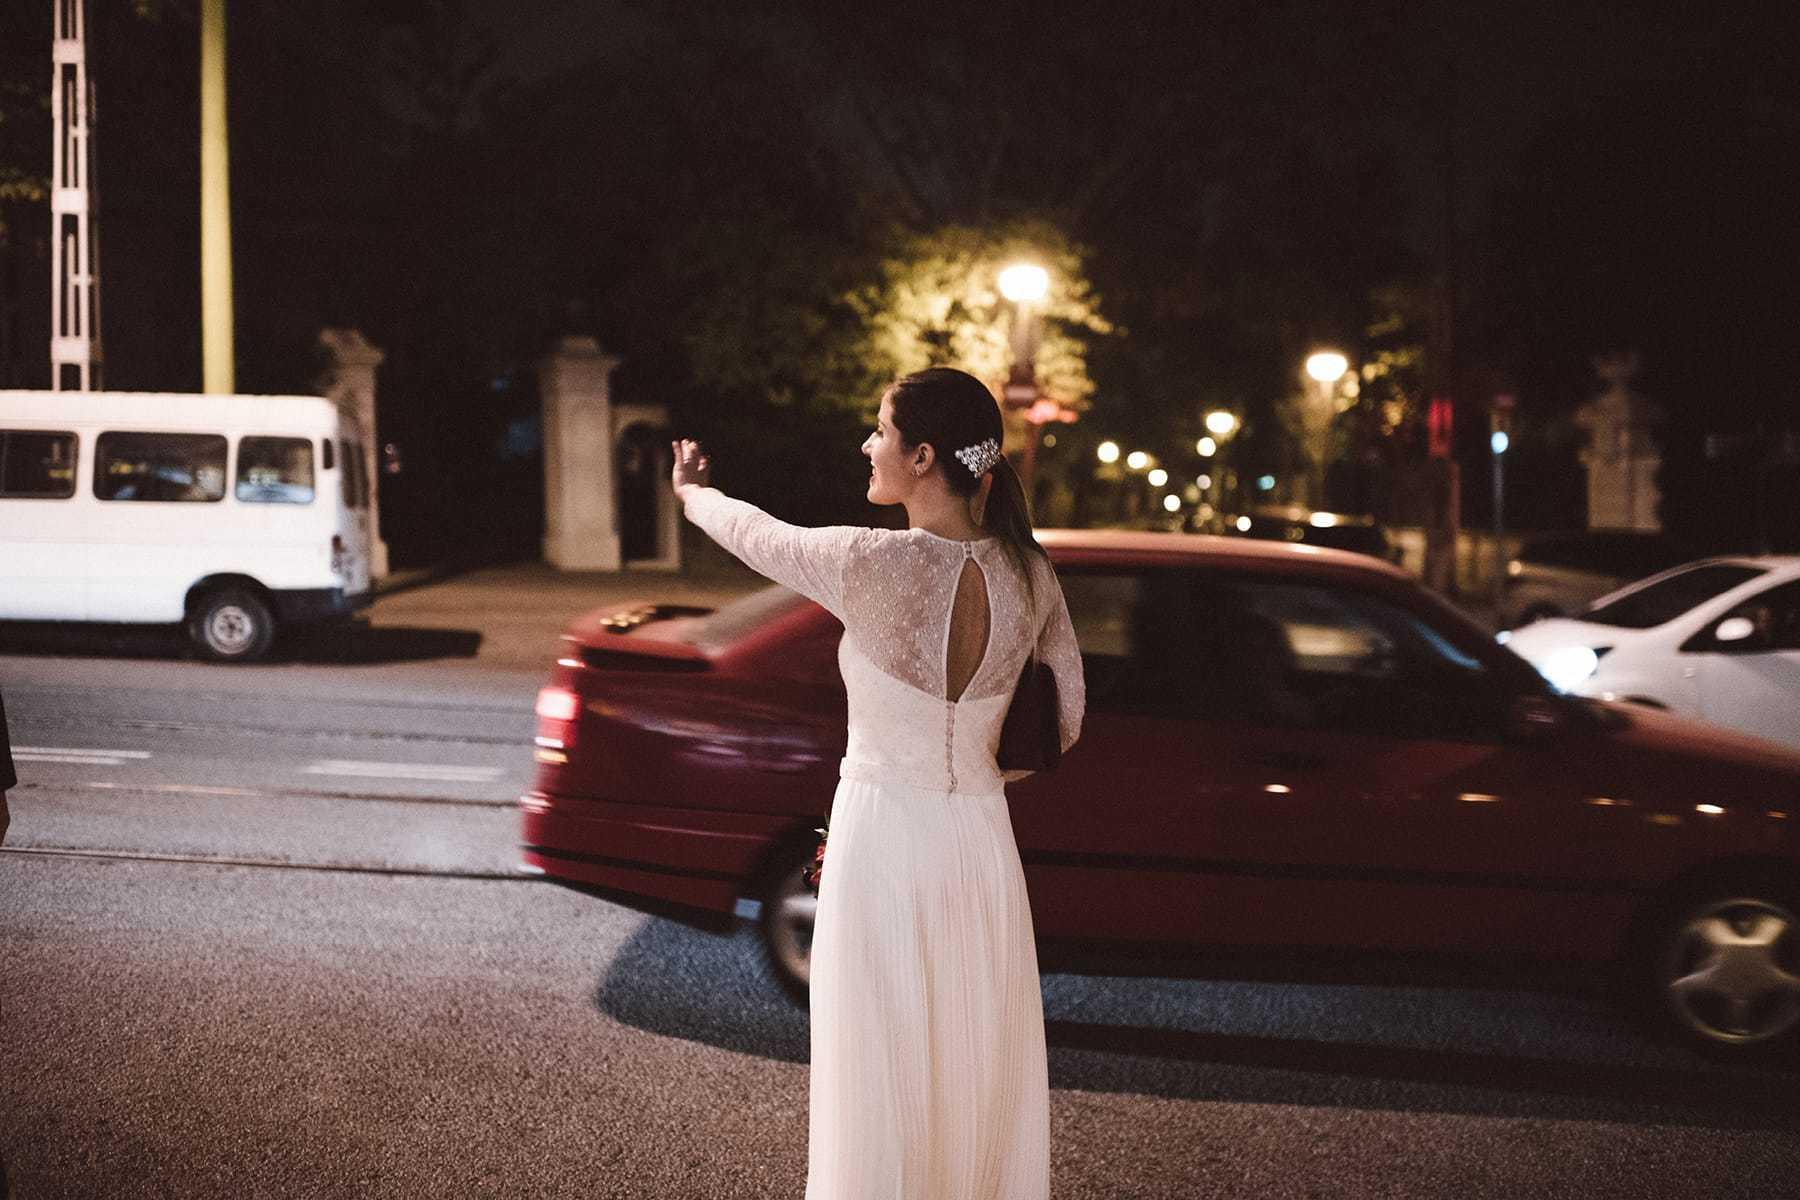 vestido_de_novia_otaduy_hilario_sanchez_fotografo_boda_barcelona_118